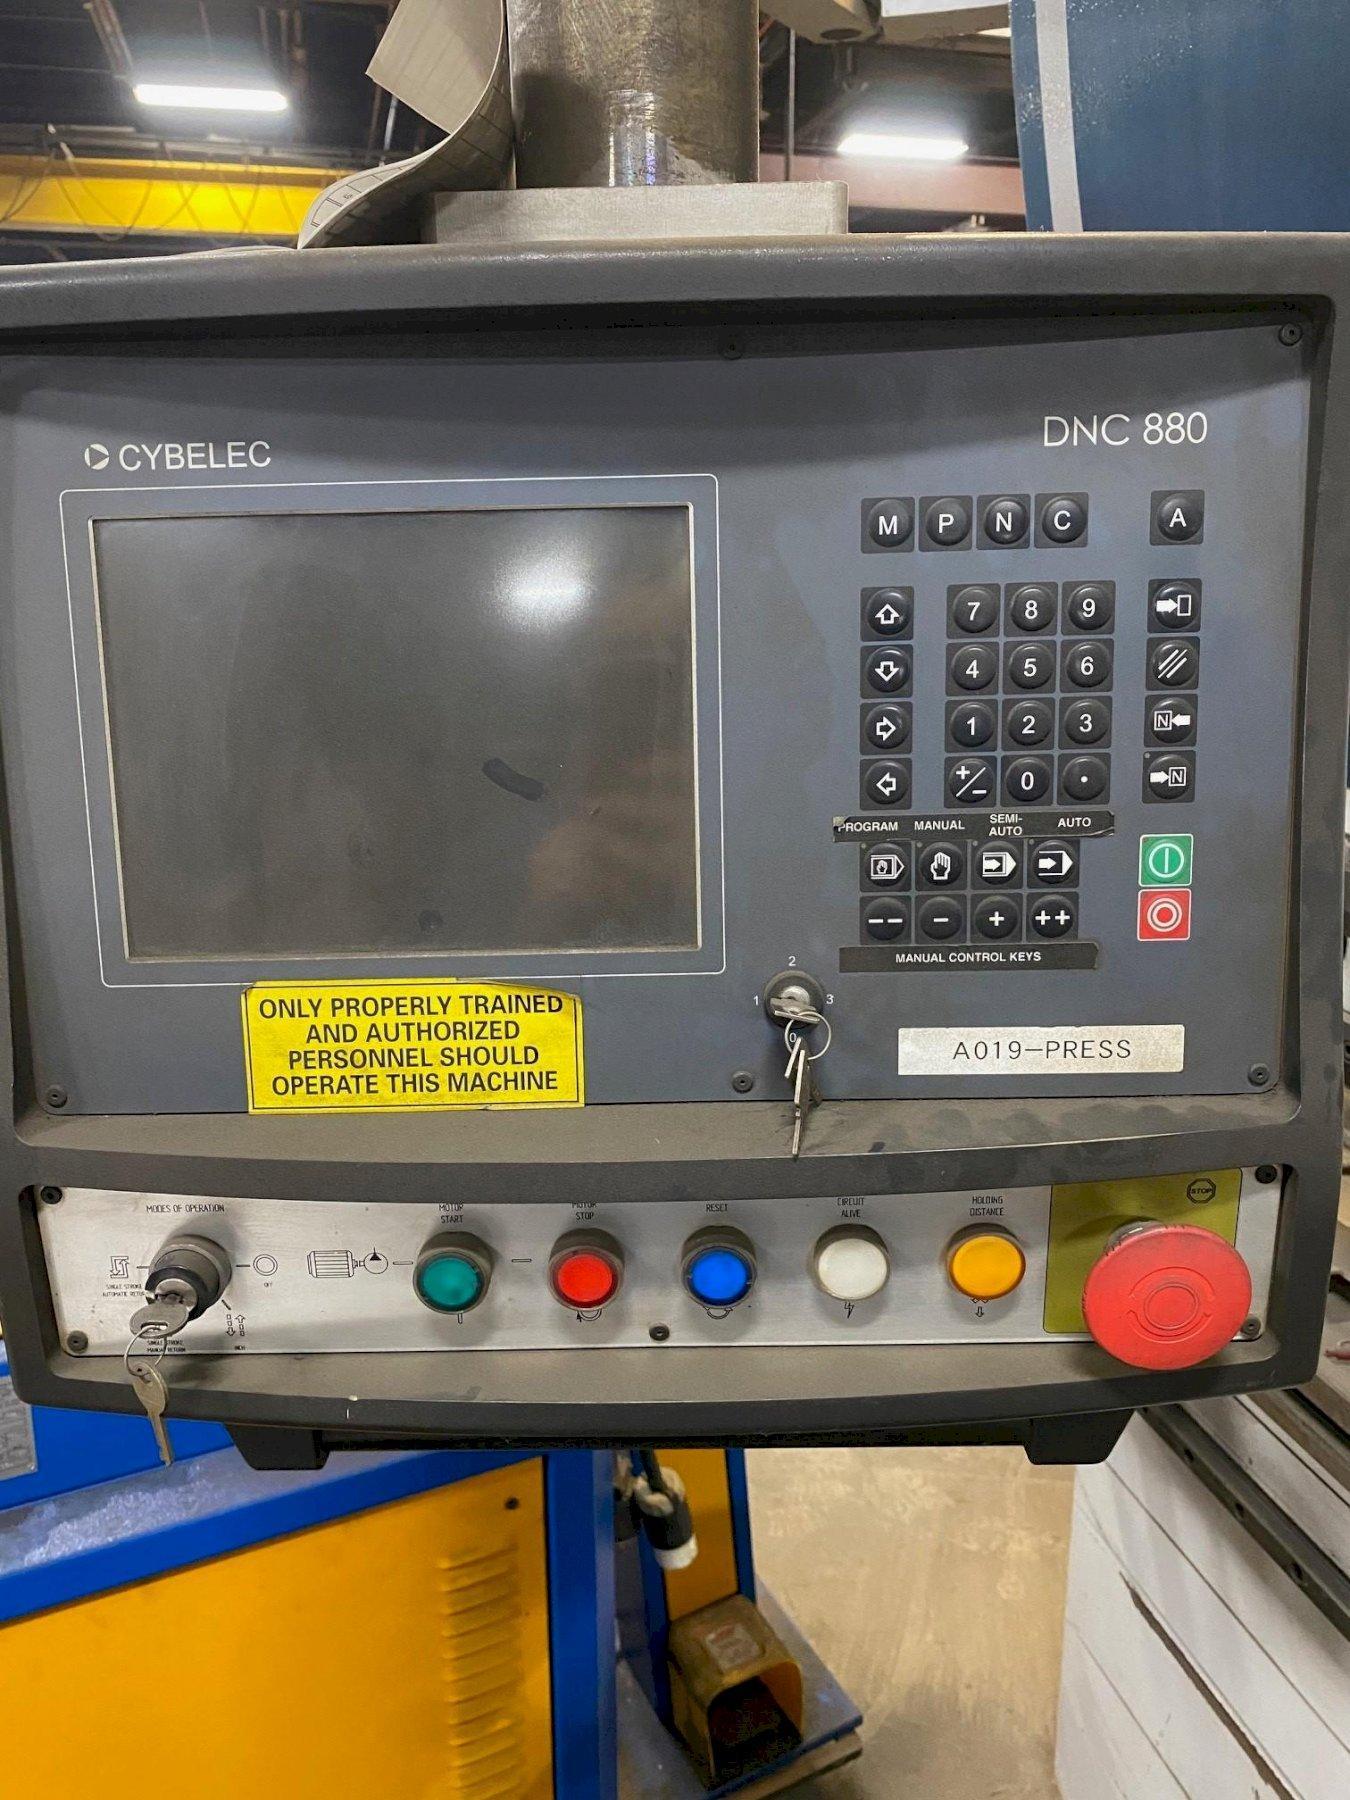 175 TON X 13' ADIRA QIHD-16040 4 AXIS CNC HYDRAULIC PRESS BRAKE. STOCK # 0530221